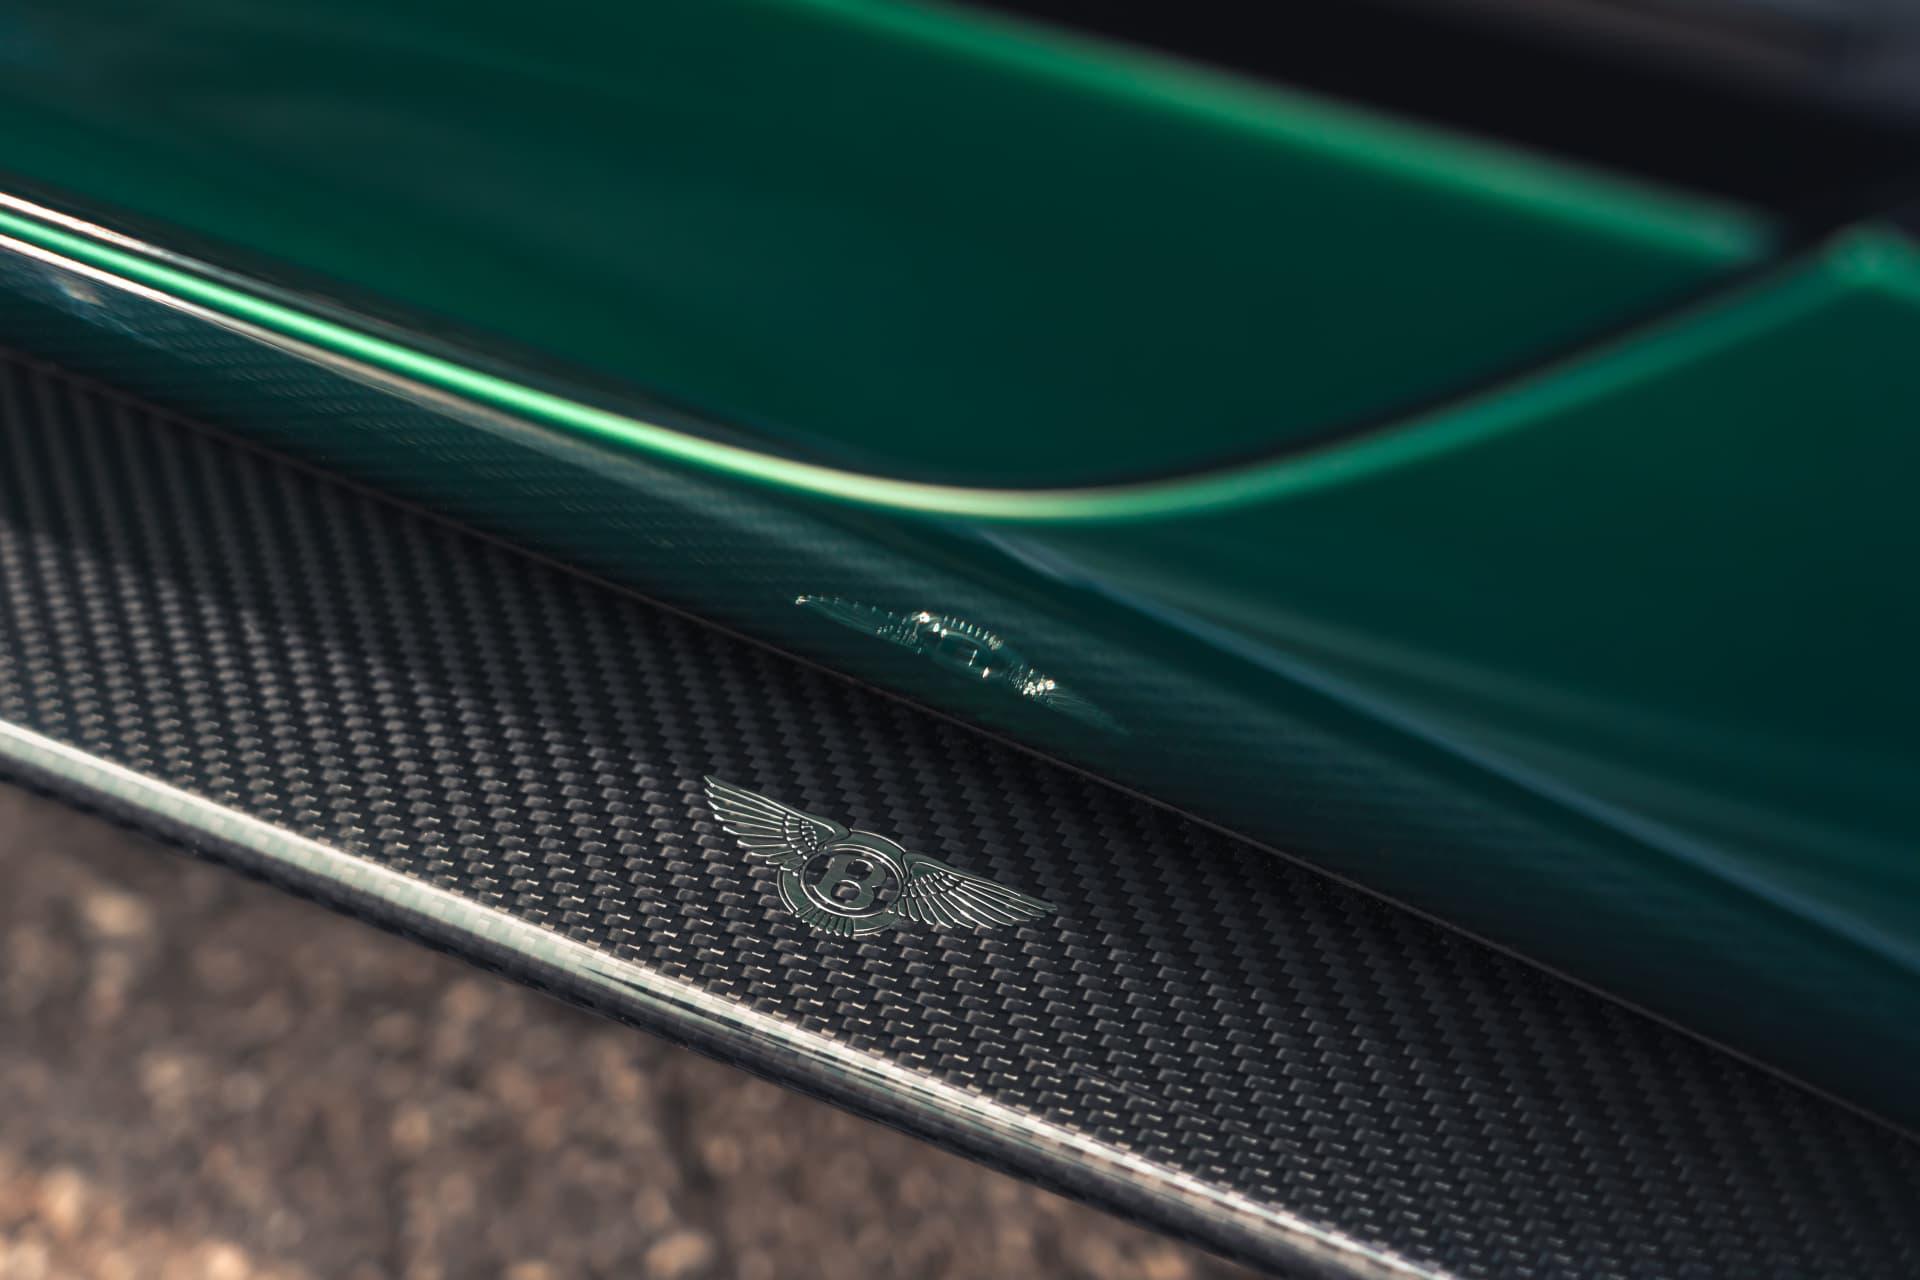 accesori izquierda y derecha Universal Drive De fibra de carbono decoraci/ón interior del coche Coche de fibra de carbono Multimedia Perilla adhesivo decorativo for Audi A6 S6 S7 C7 A7 4G8 2012-2018